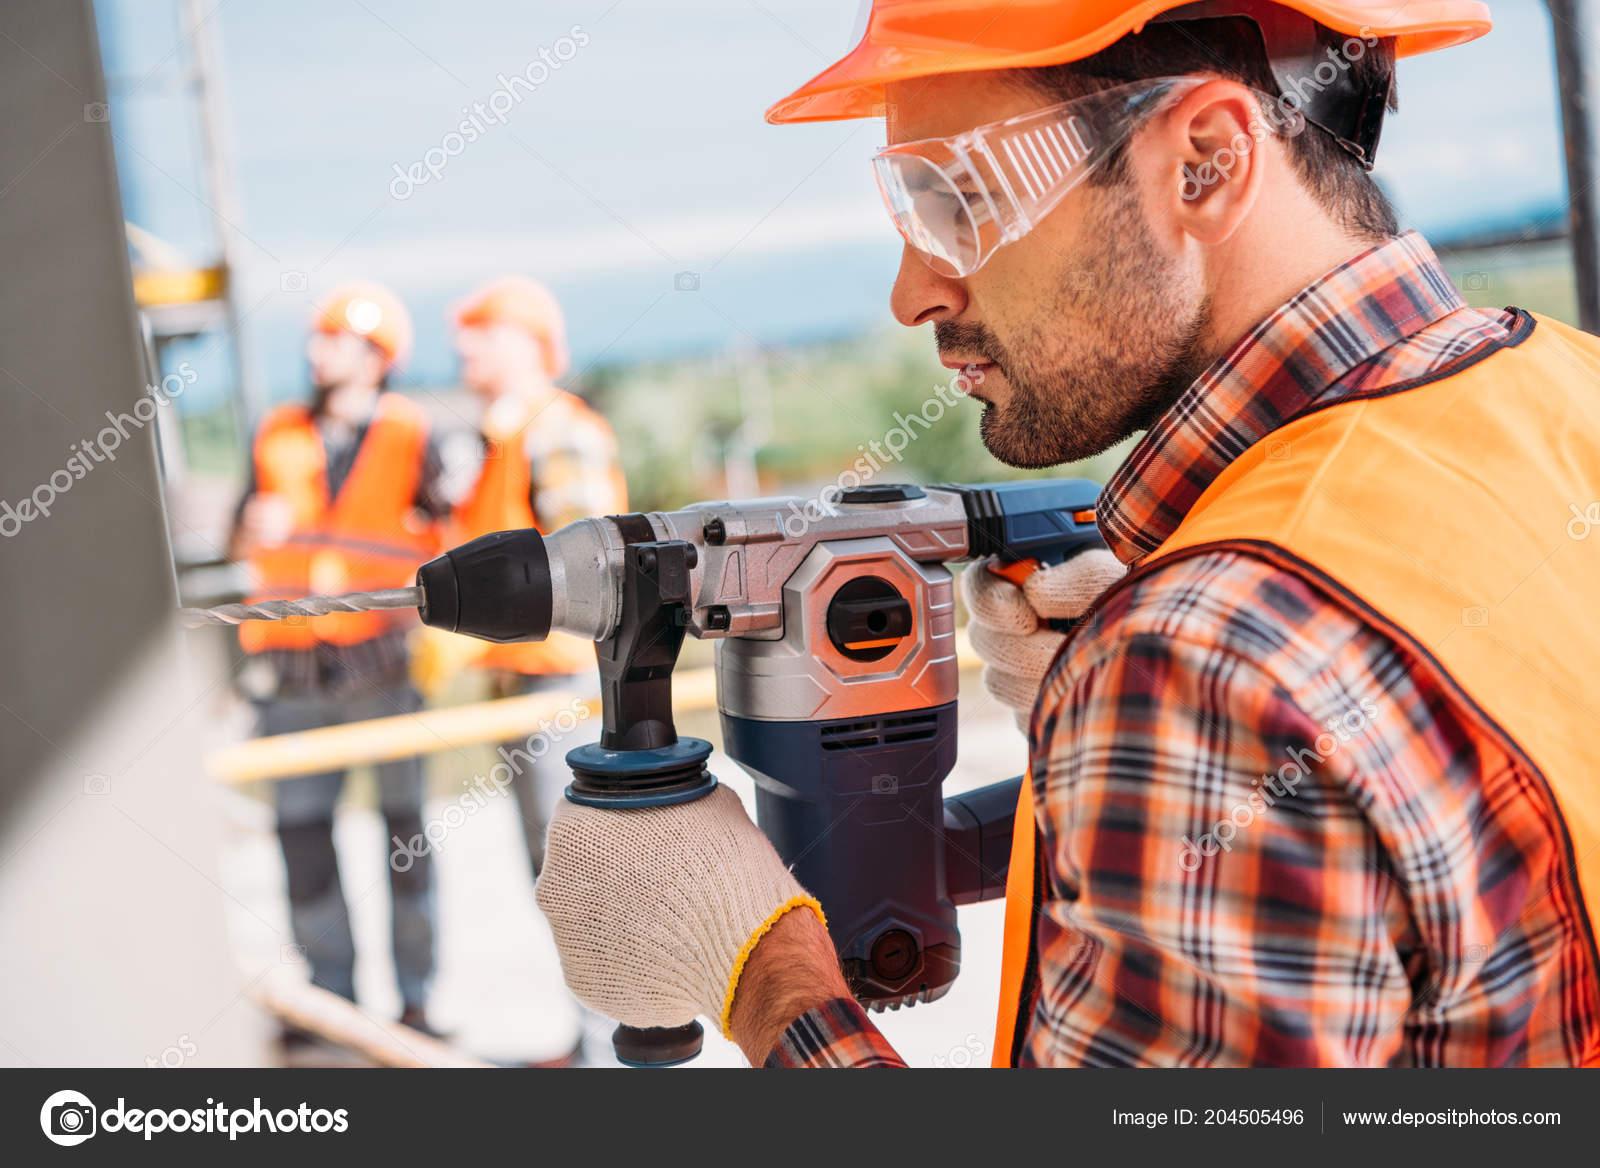 side view builder protective helmet eyeglasses using power drill